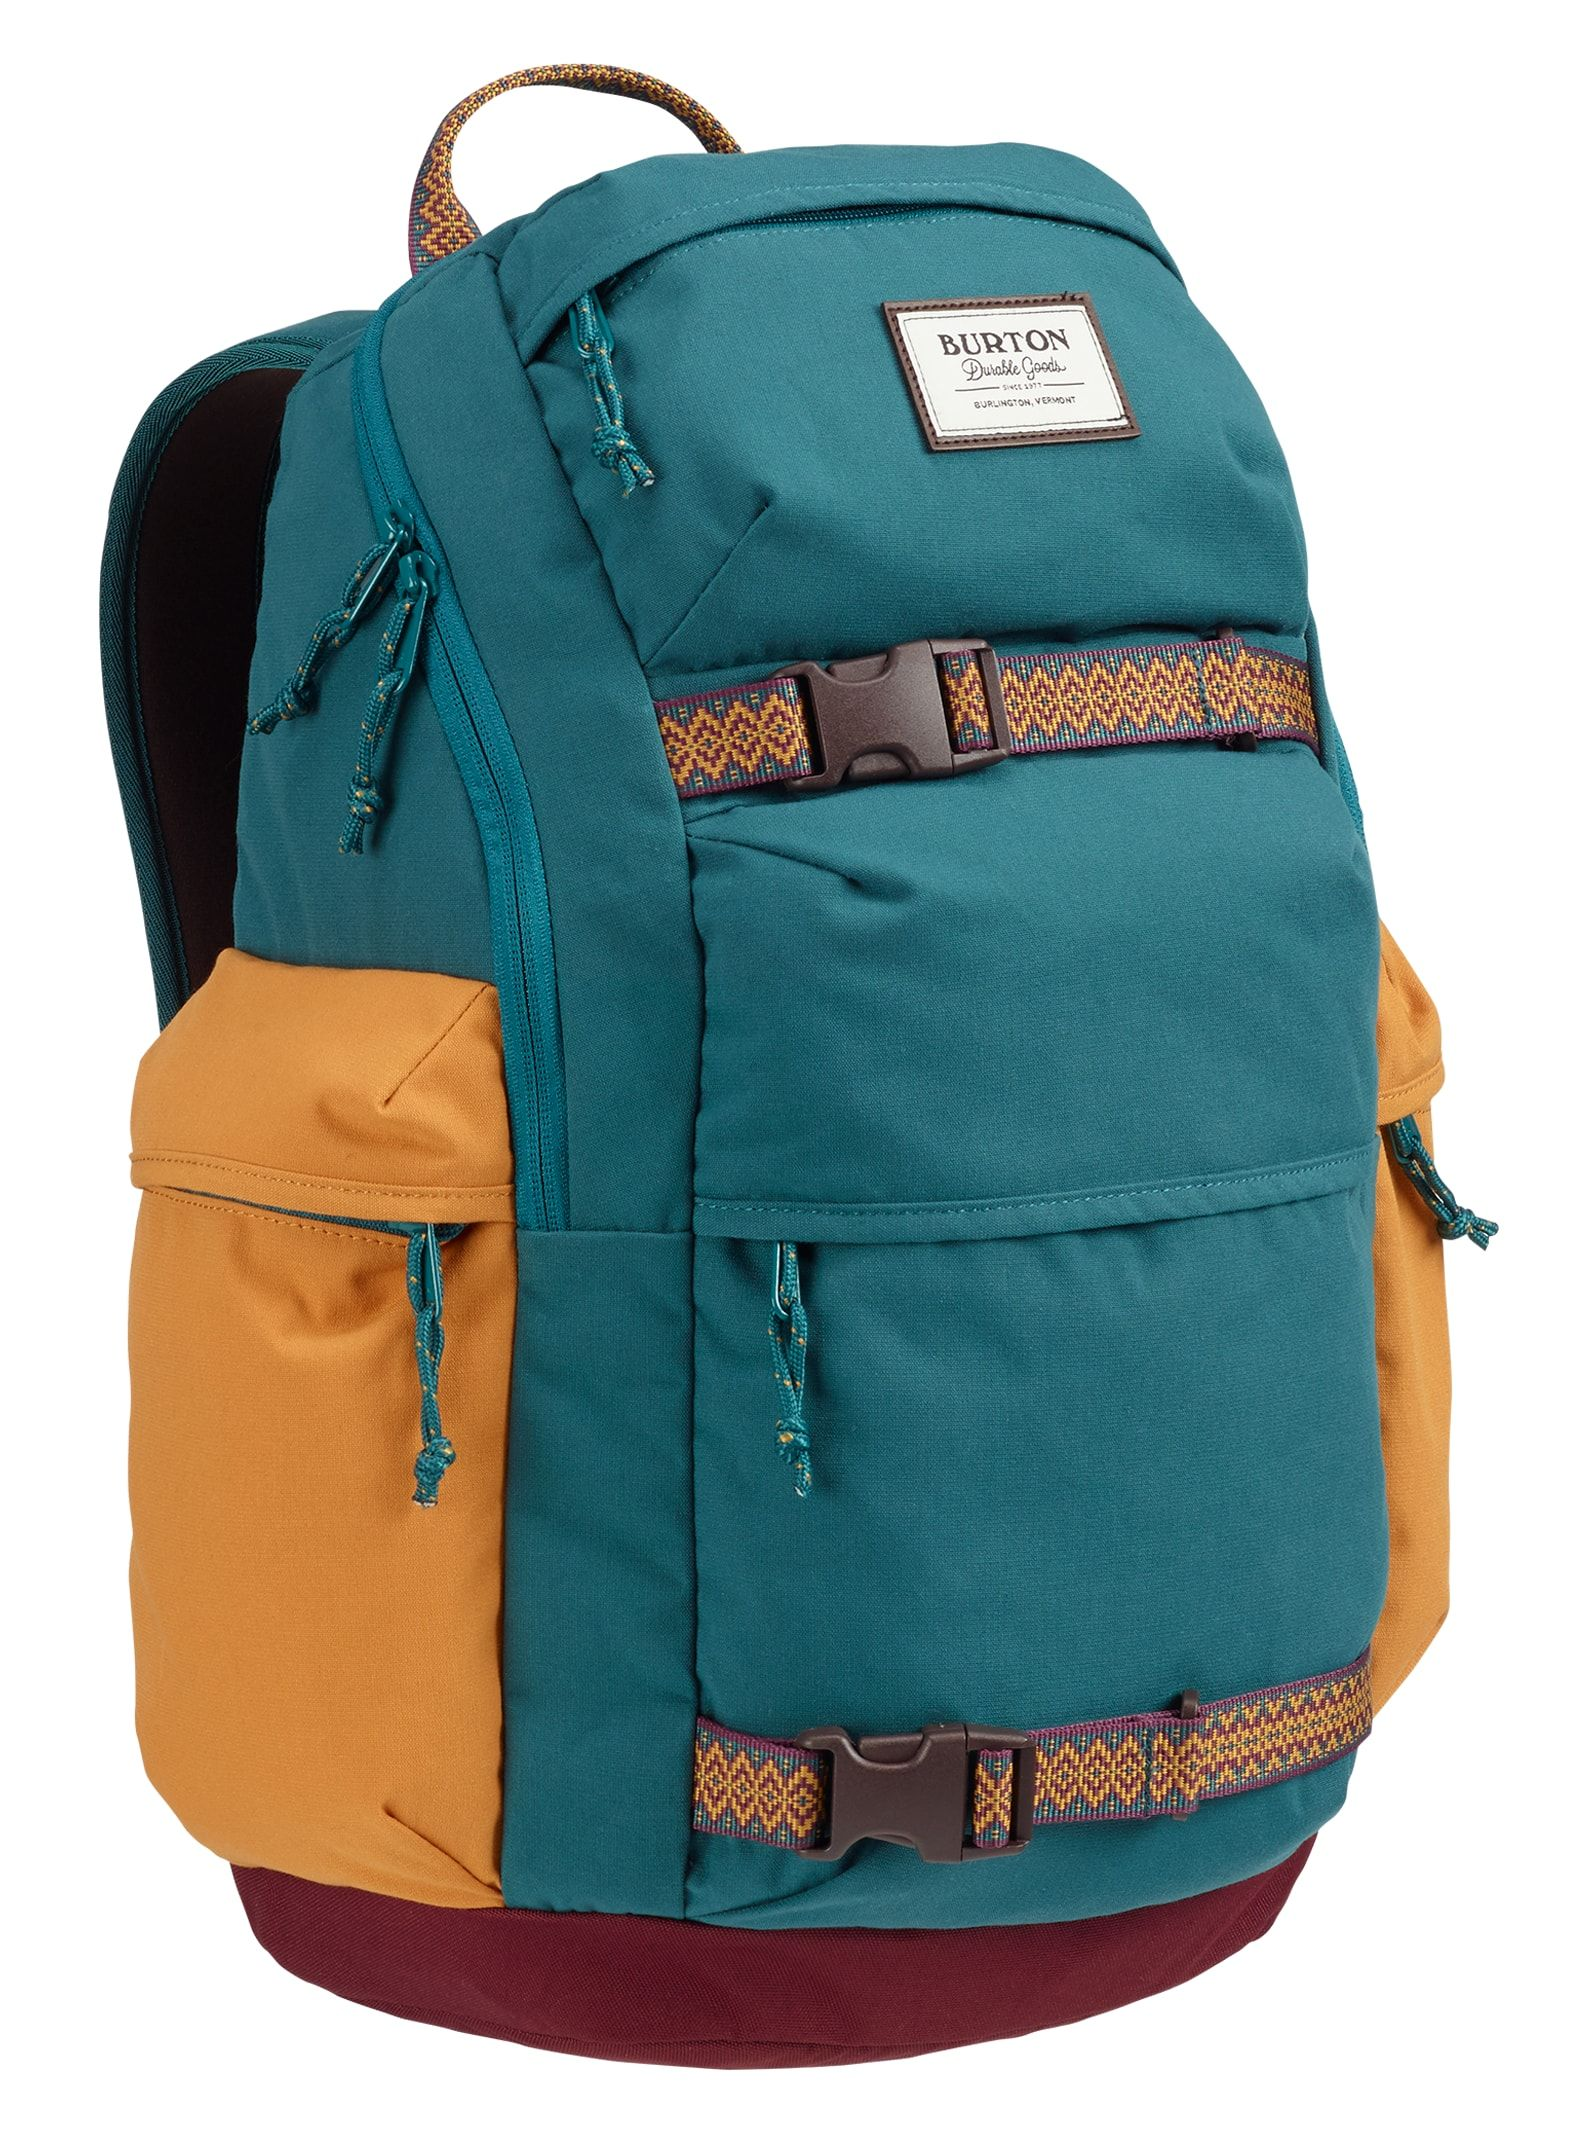 bacae6b5ac2 Burton Kilo Backpack in 2019   Products   Backpacks, Bags, School bags